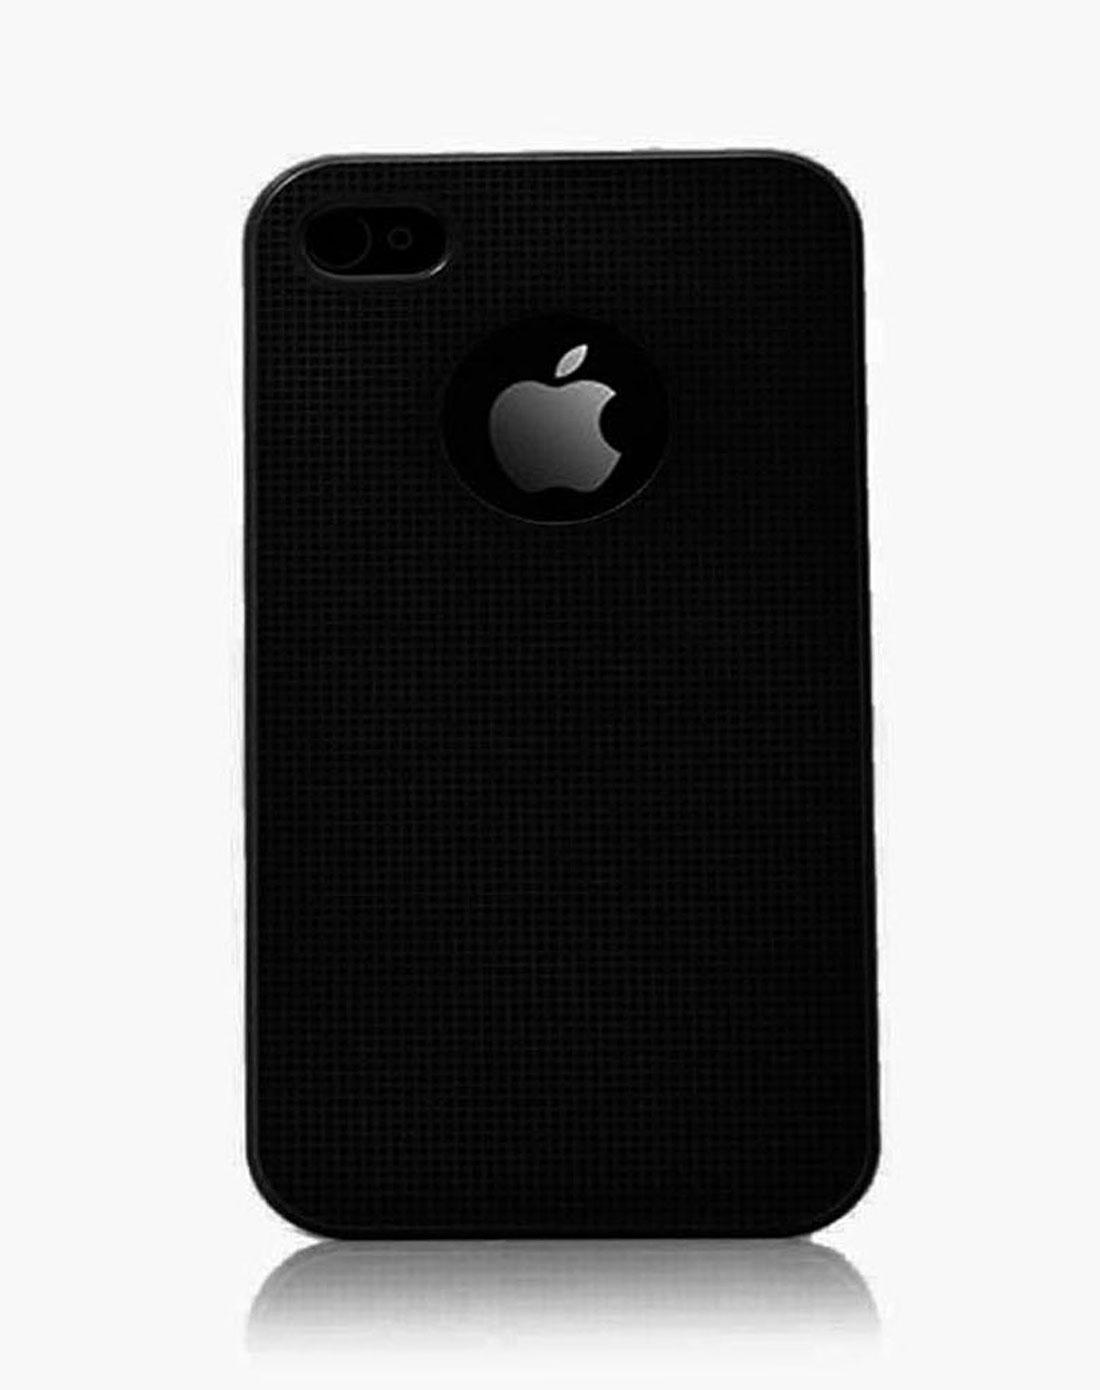 iphone 4/4s 黑色防指纹系列保护壳